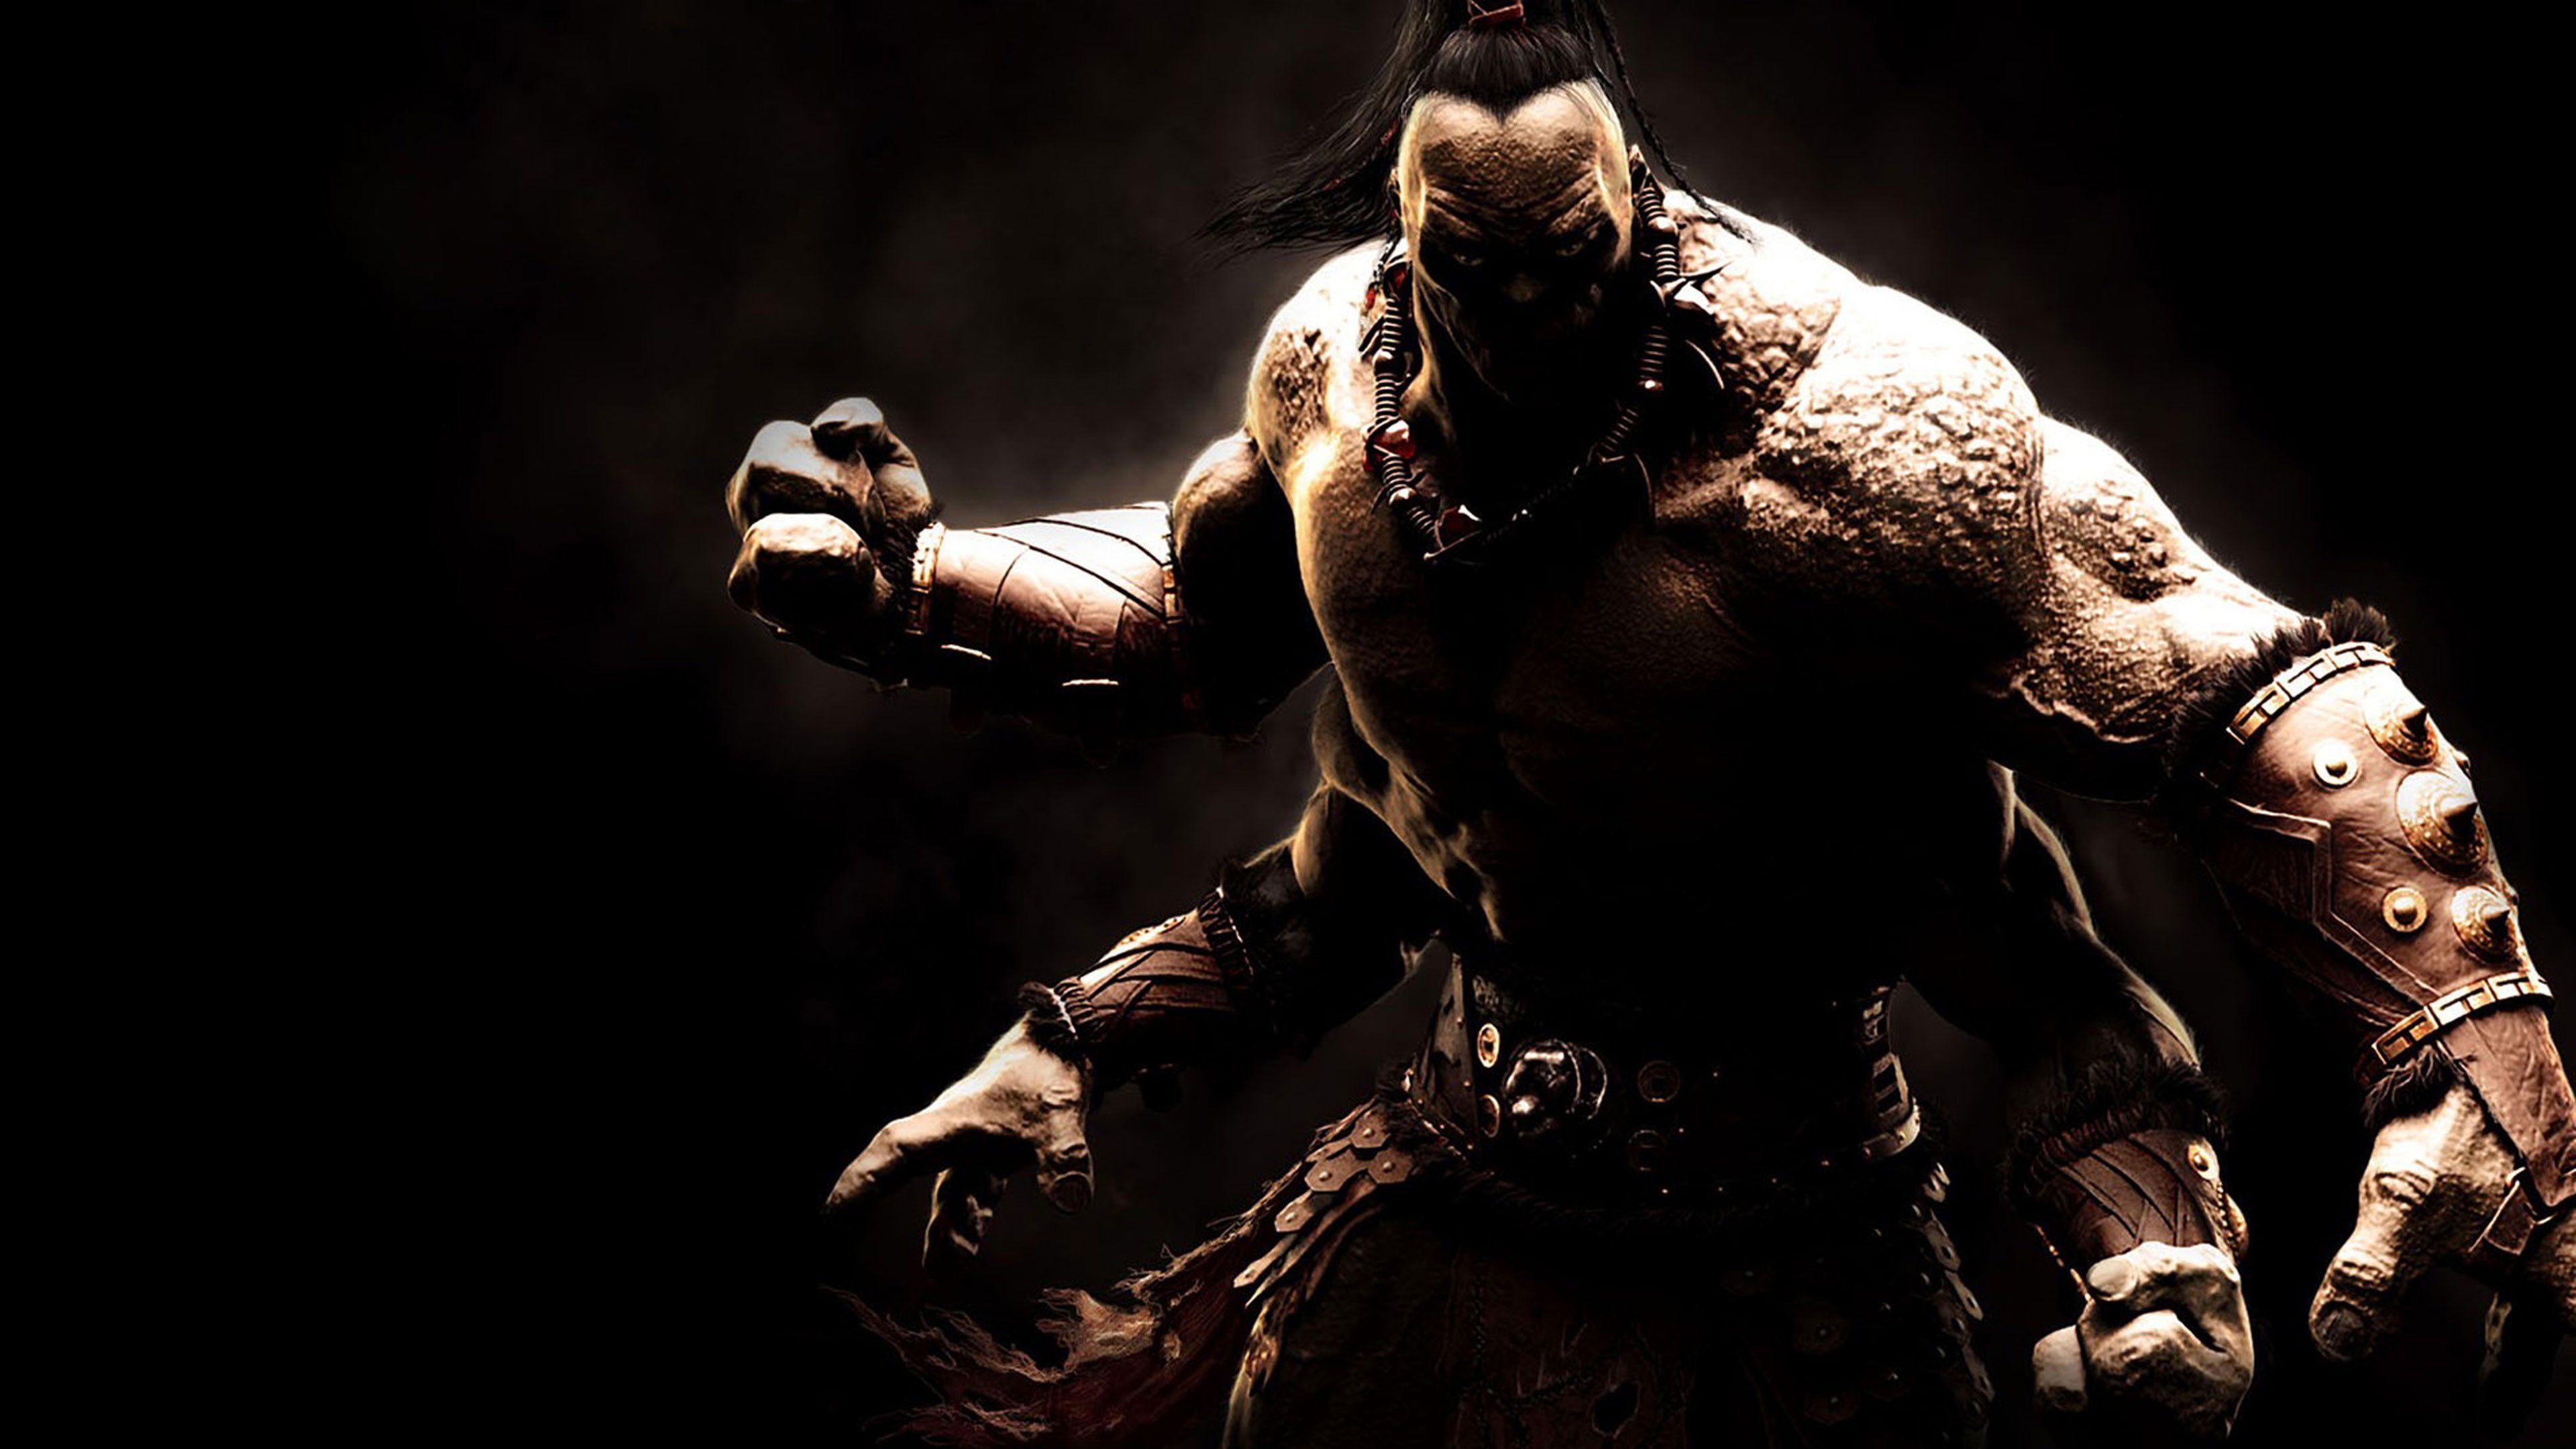 Wallpapers Mortal Kombat Shaolin Monks HD - Wallpaper Cave